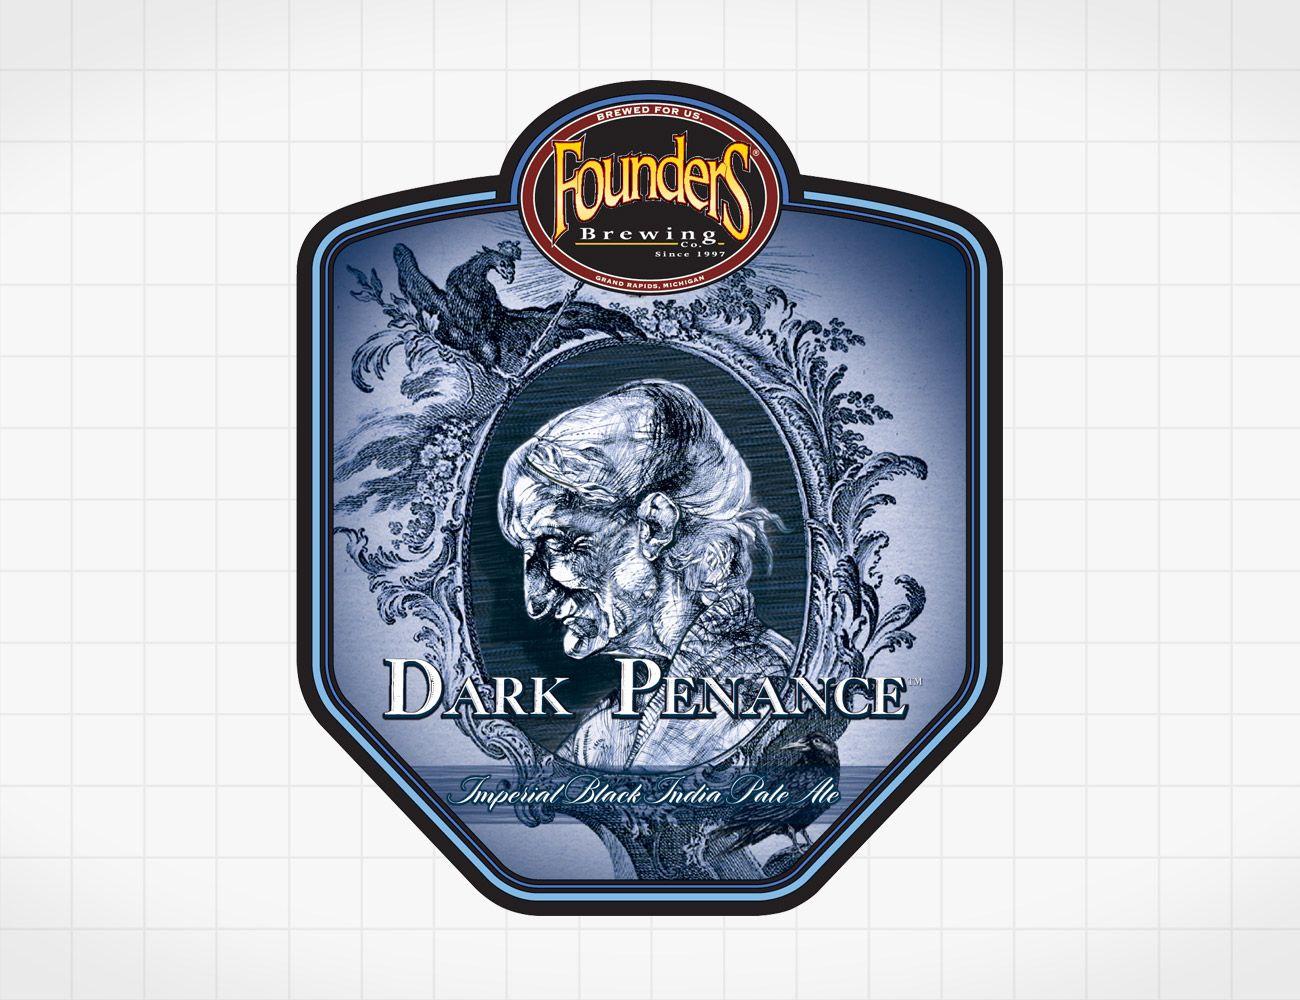 founders-brewery-dark-penance-logo-gear-patrol